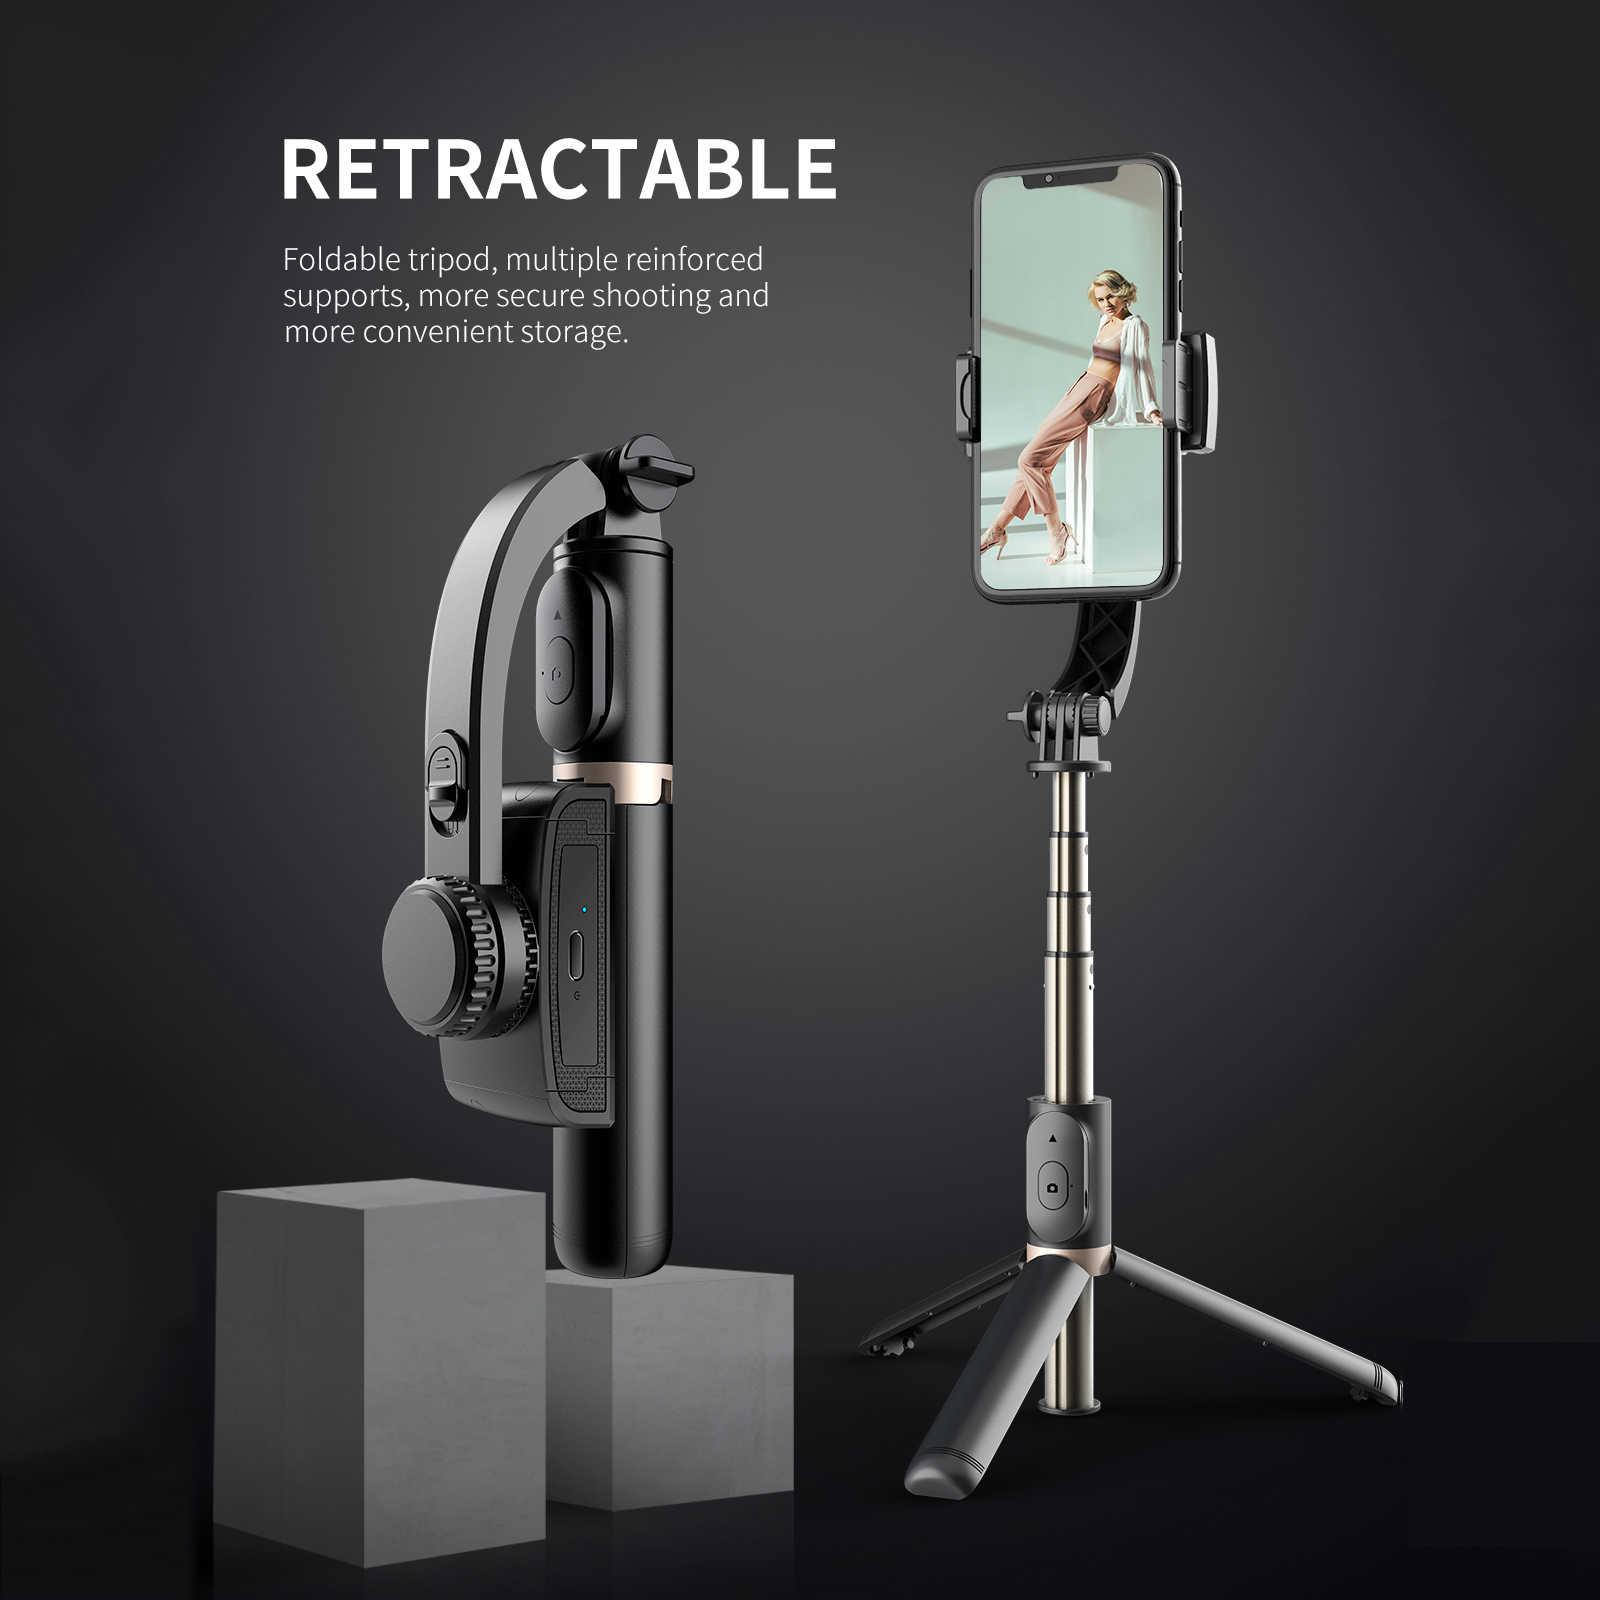 Estabilizador de cardán de mano para teléfono inteligente trípode/palo  Selfie antivibración inalámbrico Bluetooth Control remoto extensible  plegable|palos de selfie| - AliExpress